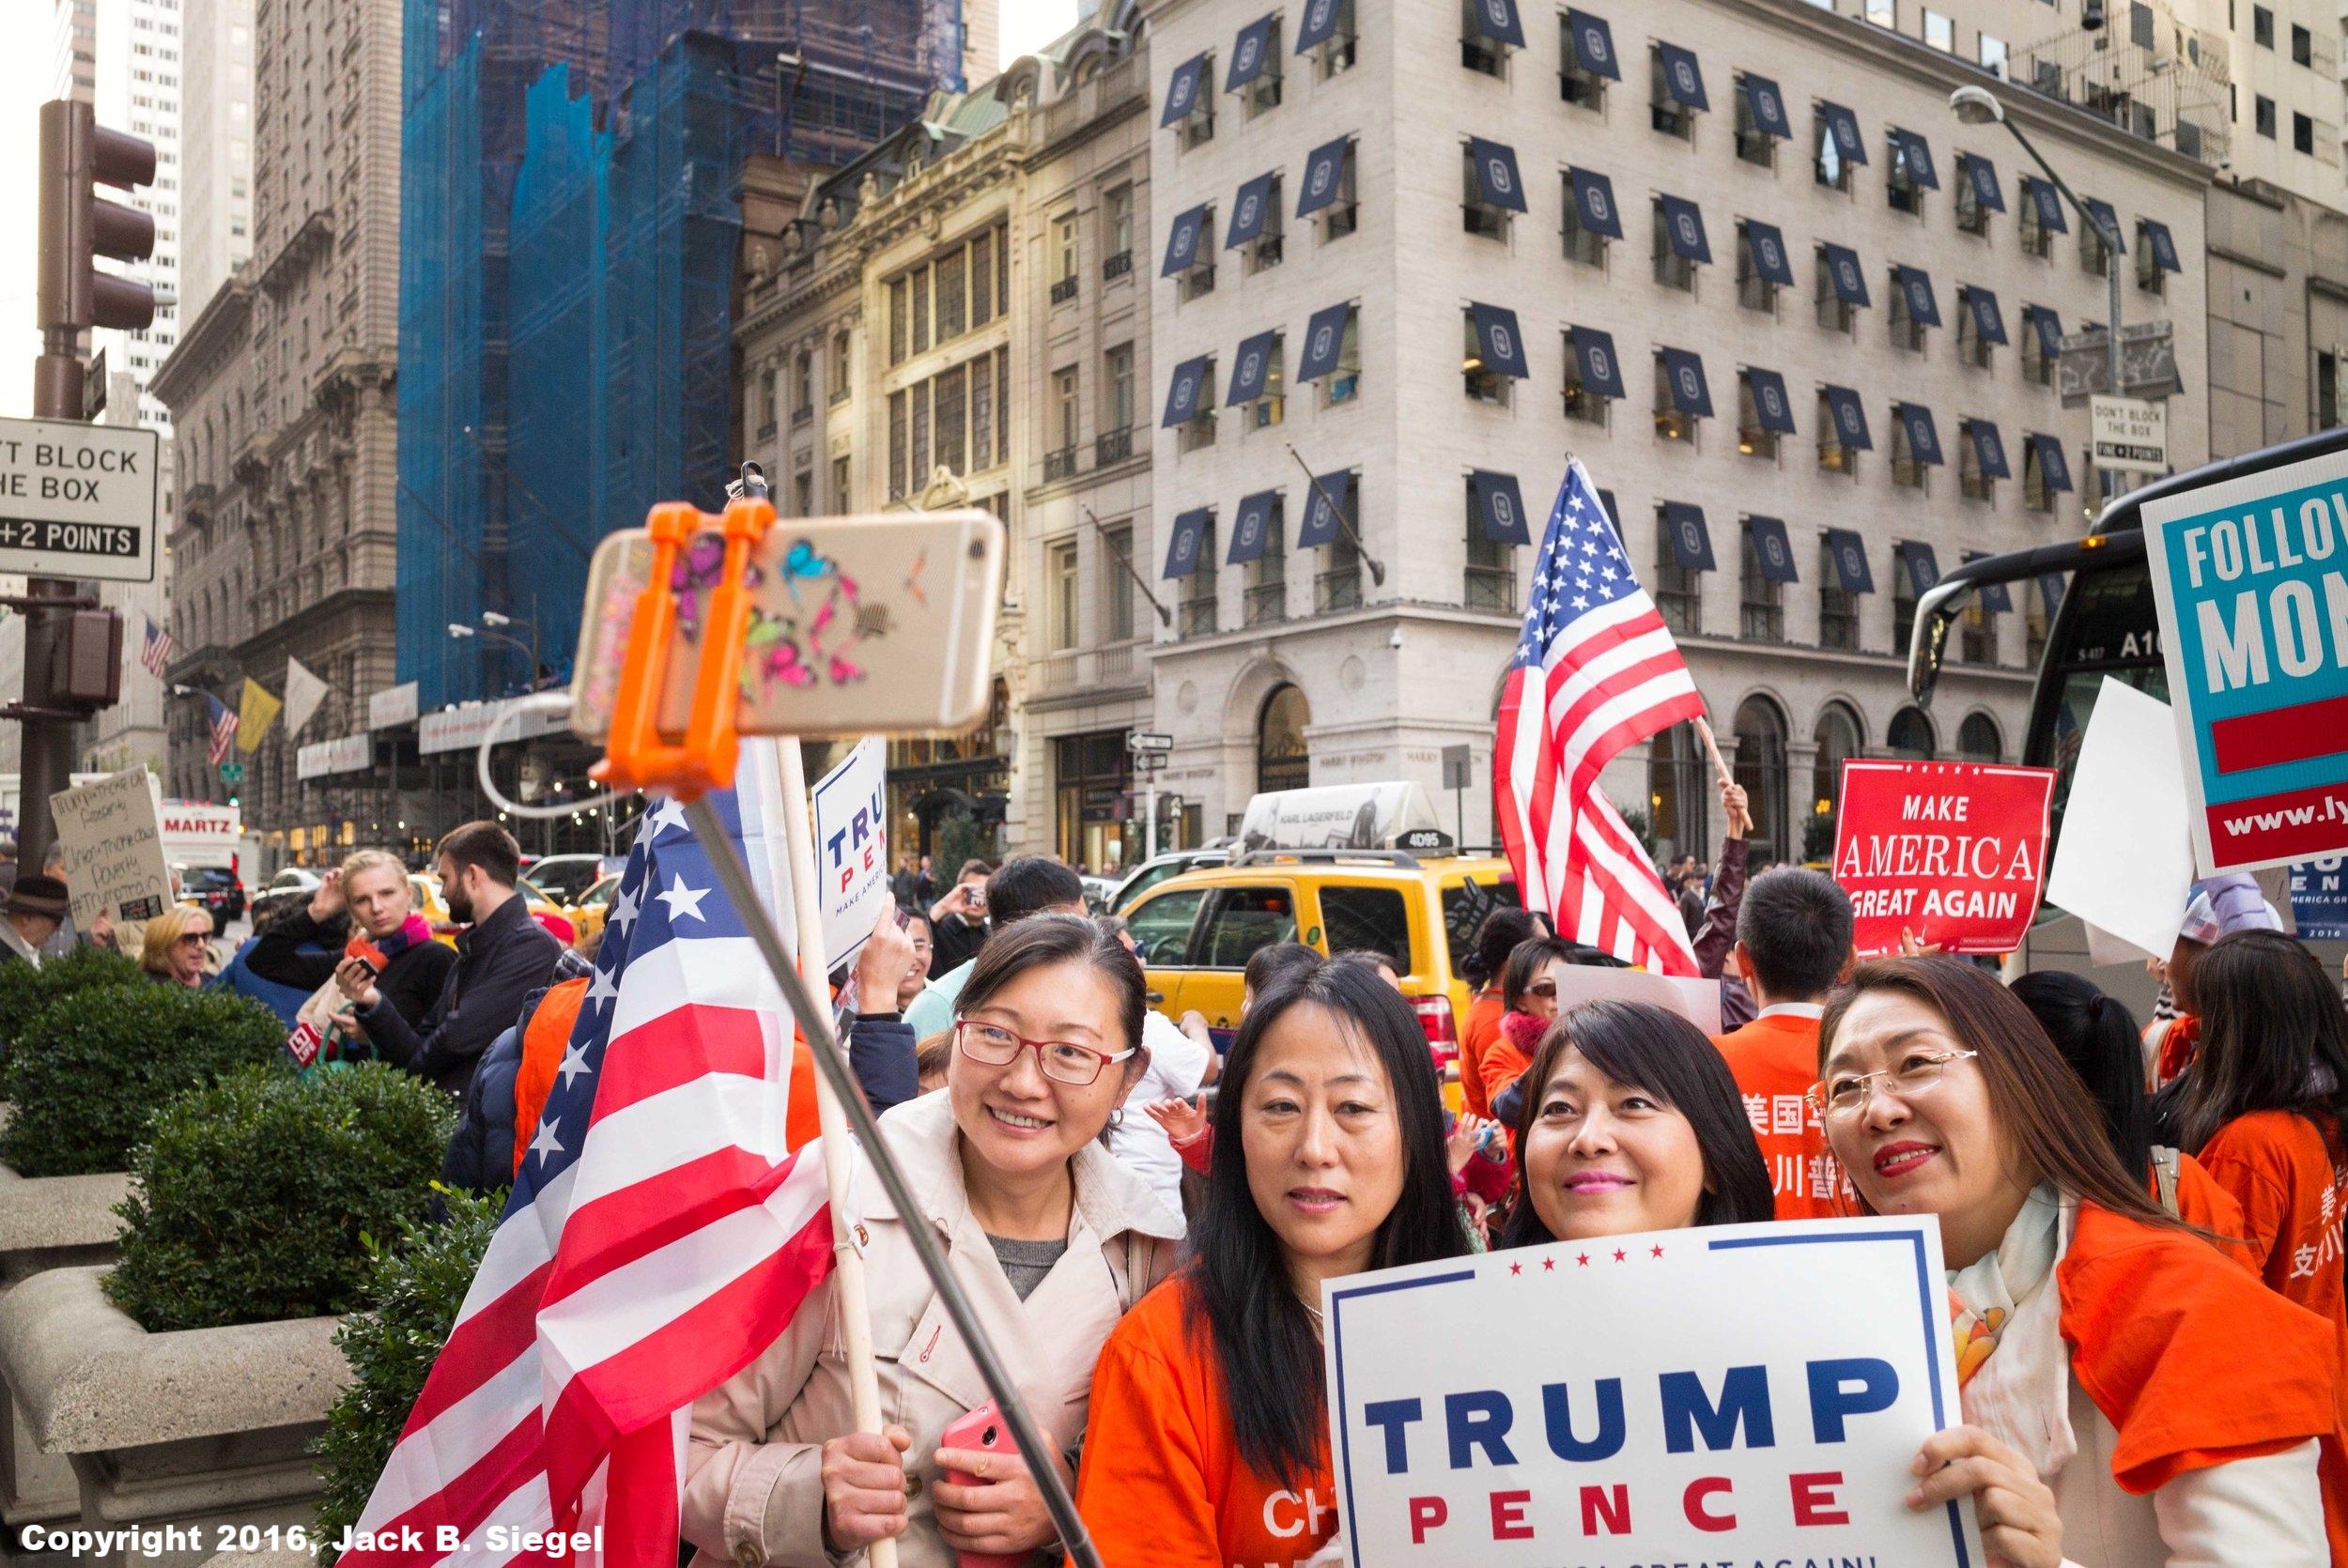 The Trump Girls Take a Selfie